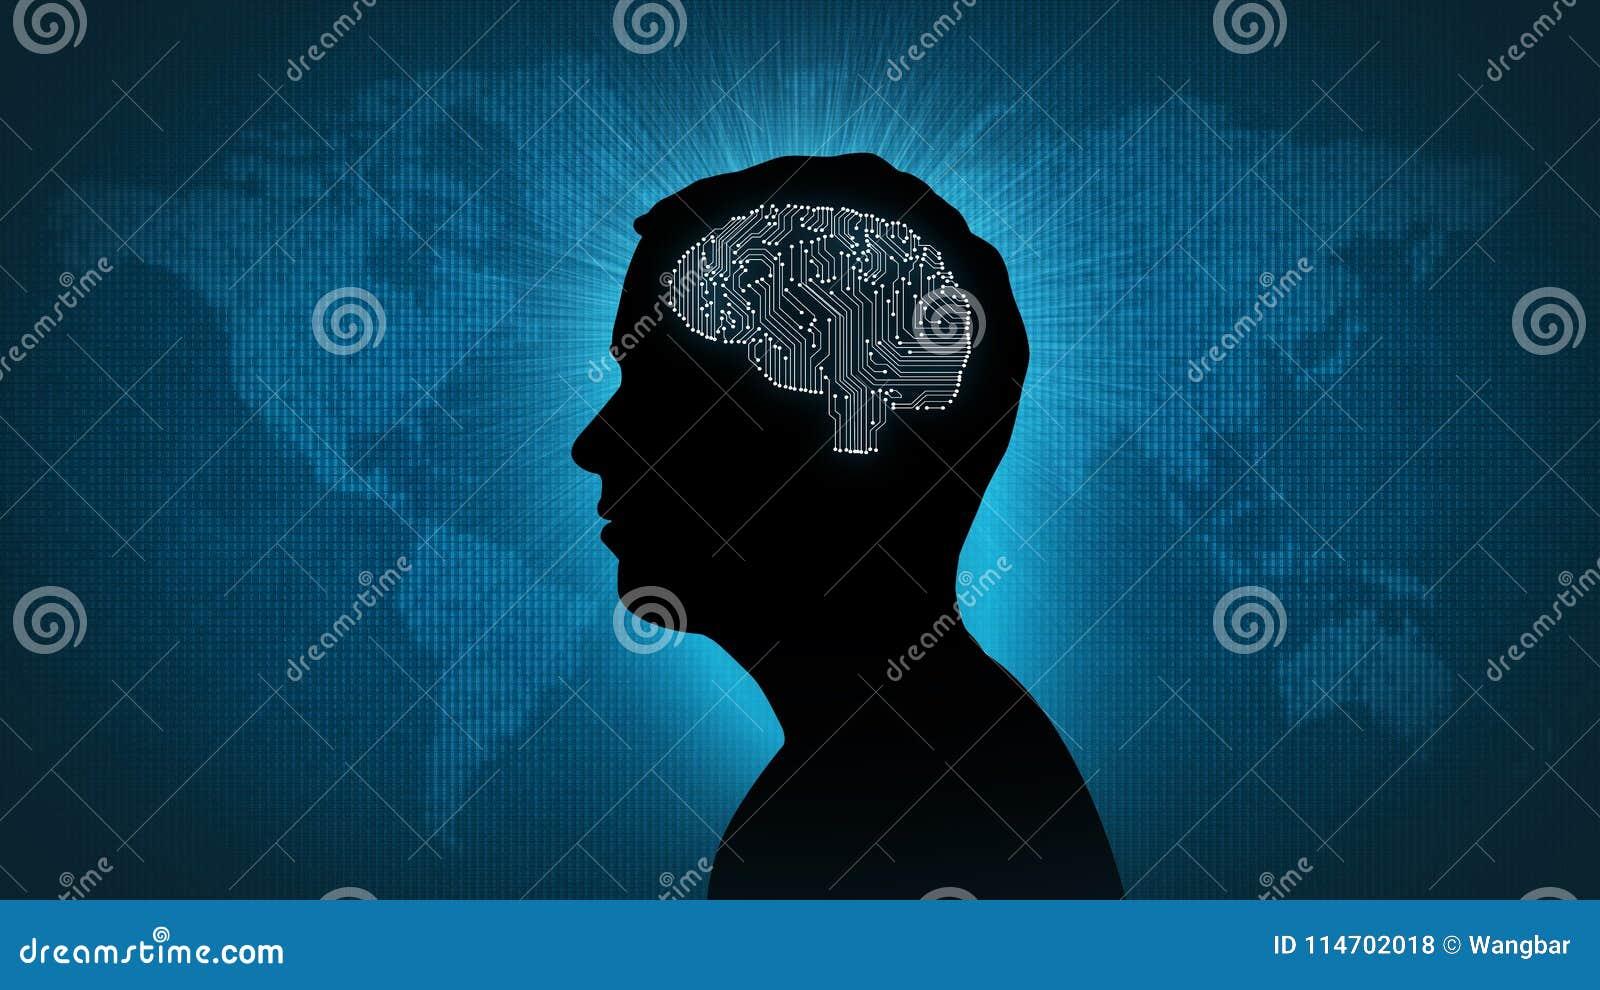 Computer circuit brain - man in front of digital world